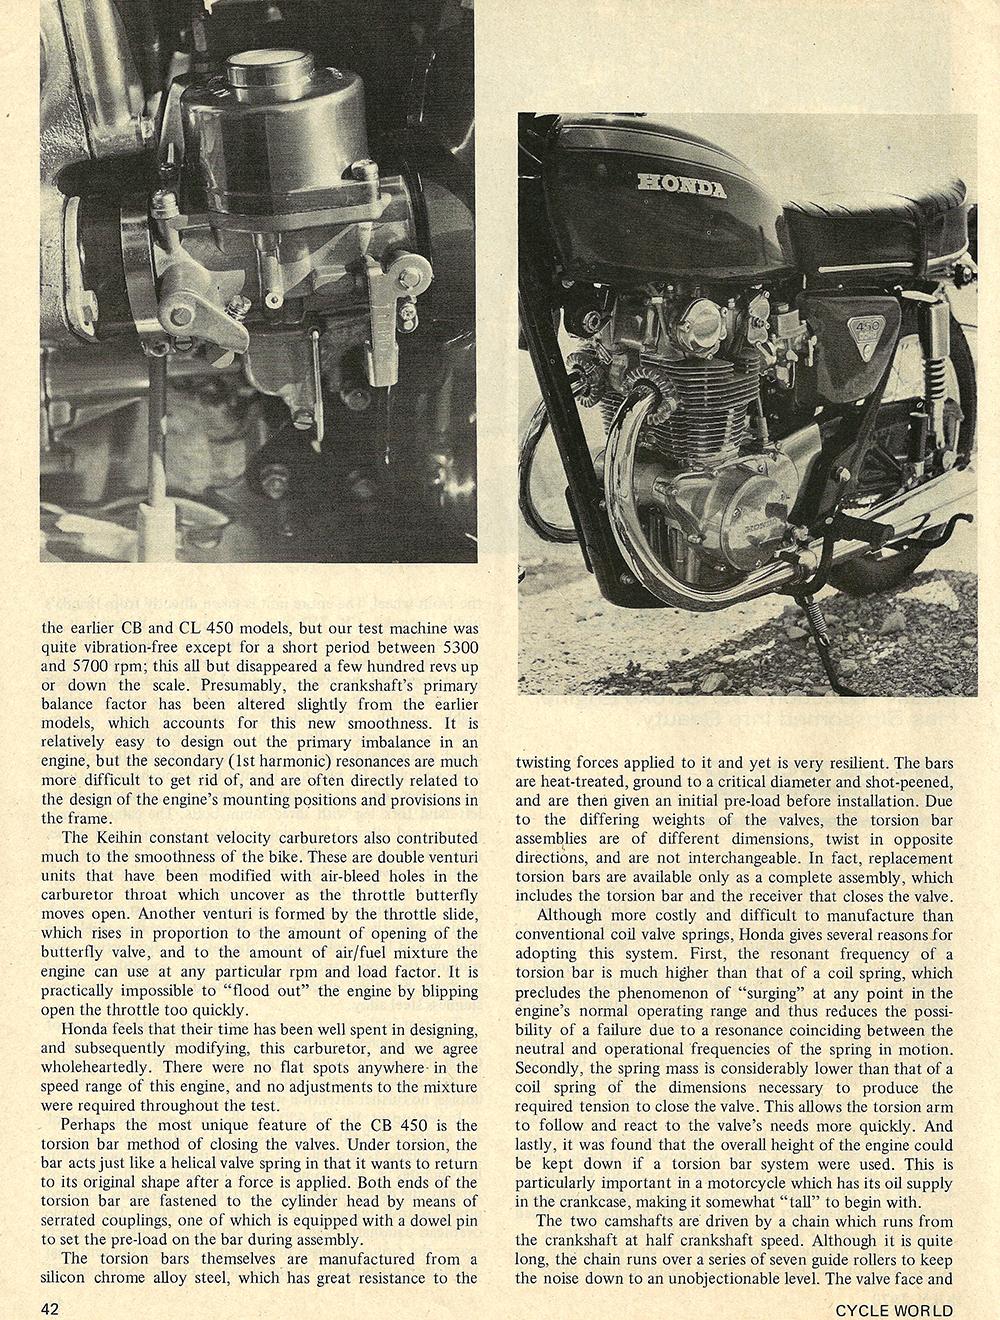 1970 Honda CB450 road test 02.jpg